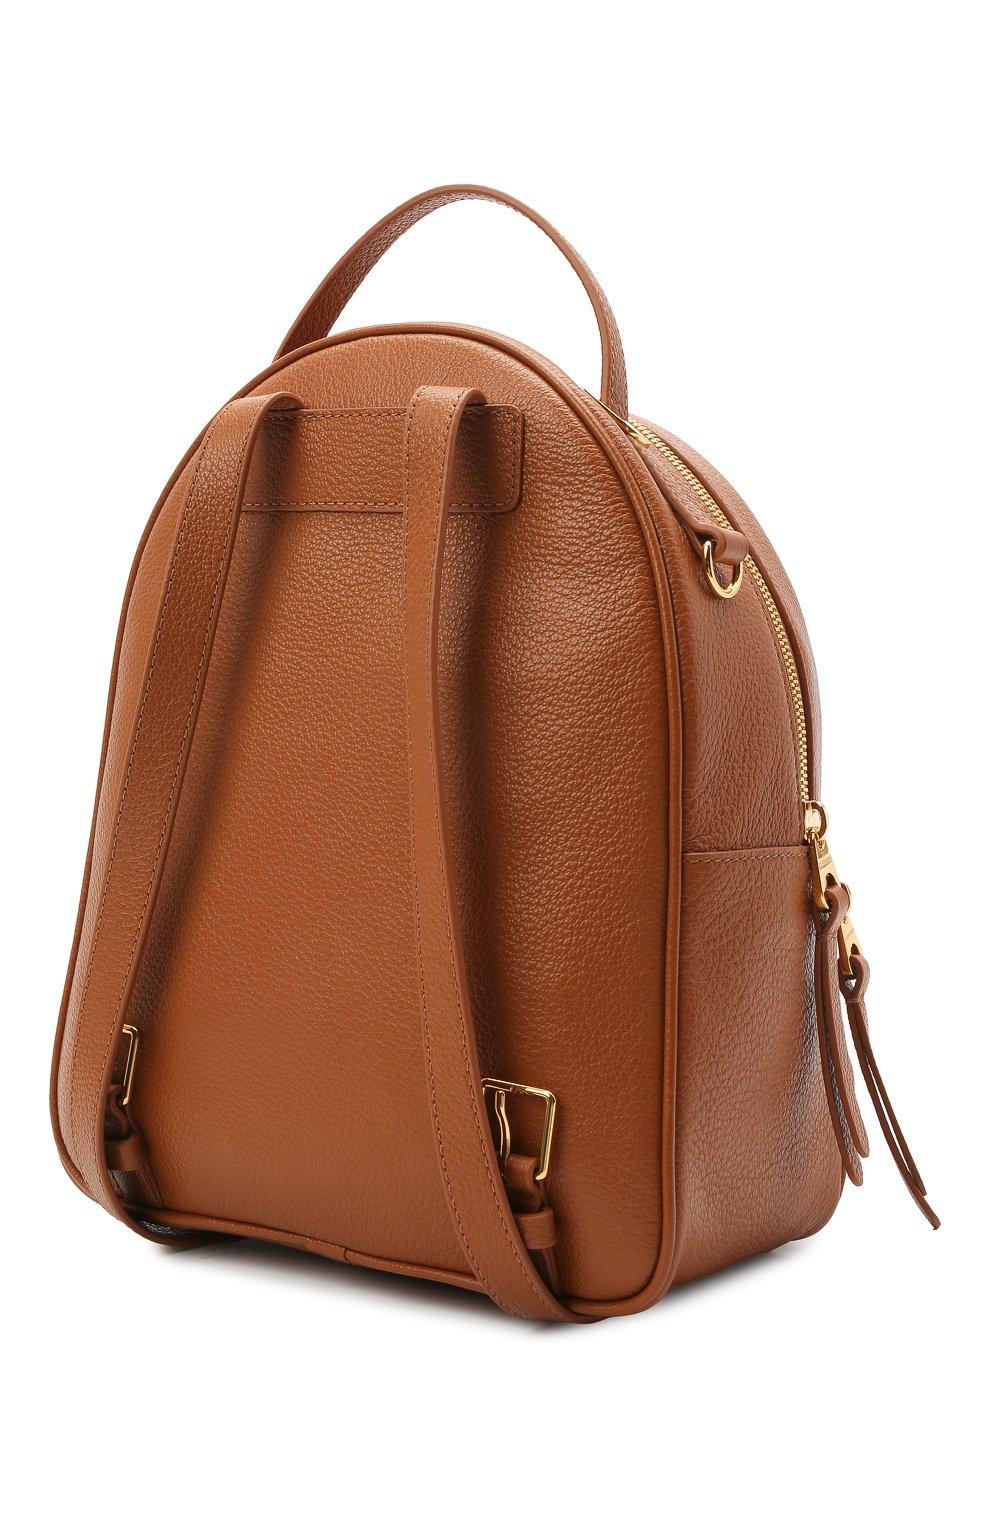 Женский рюкзак lea COCCINELLE коричневого цвета, арт. E1 H60 14 01 01 | Фото 3